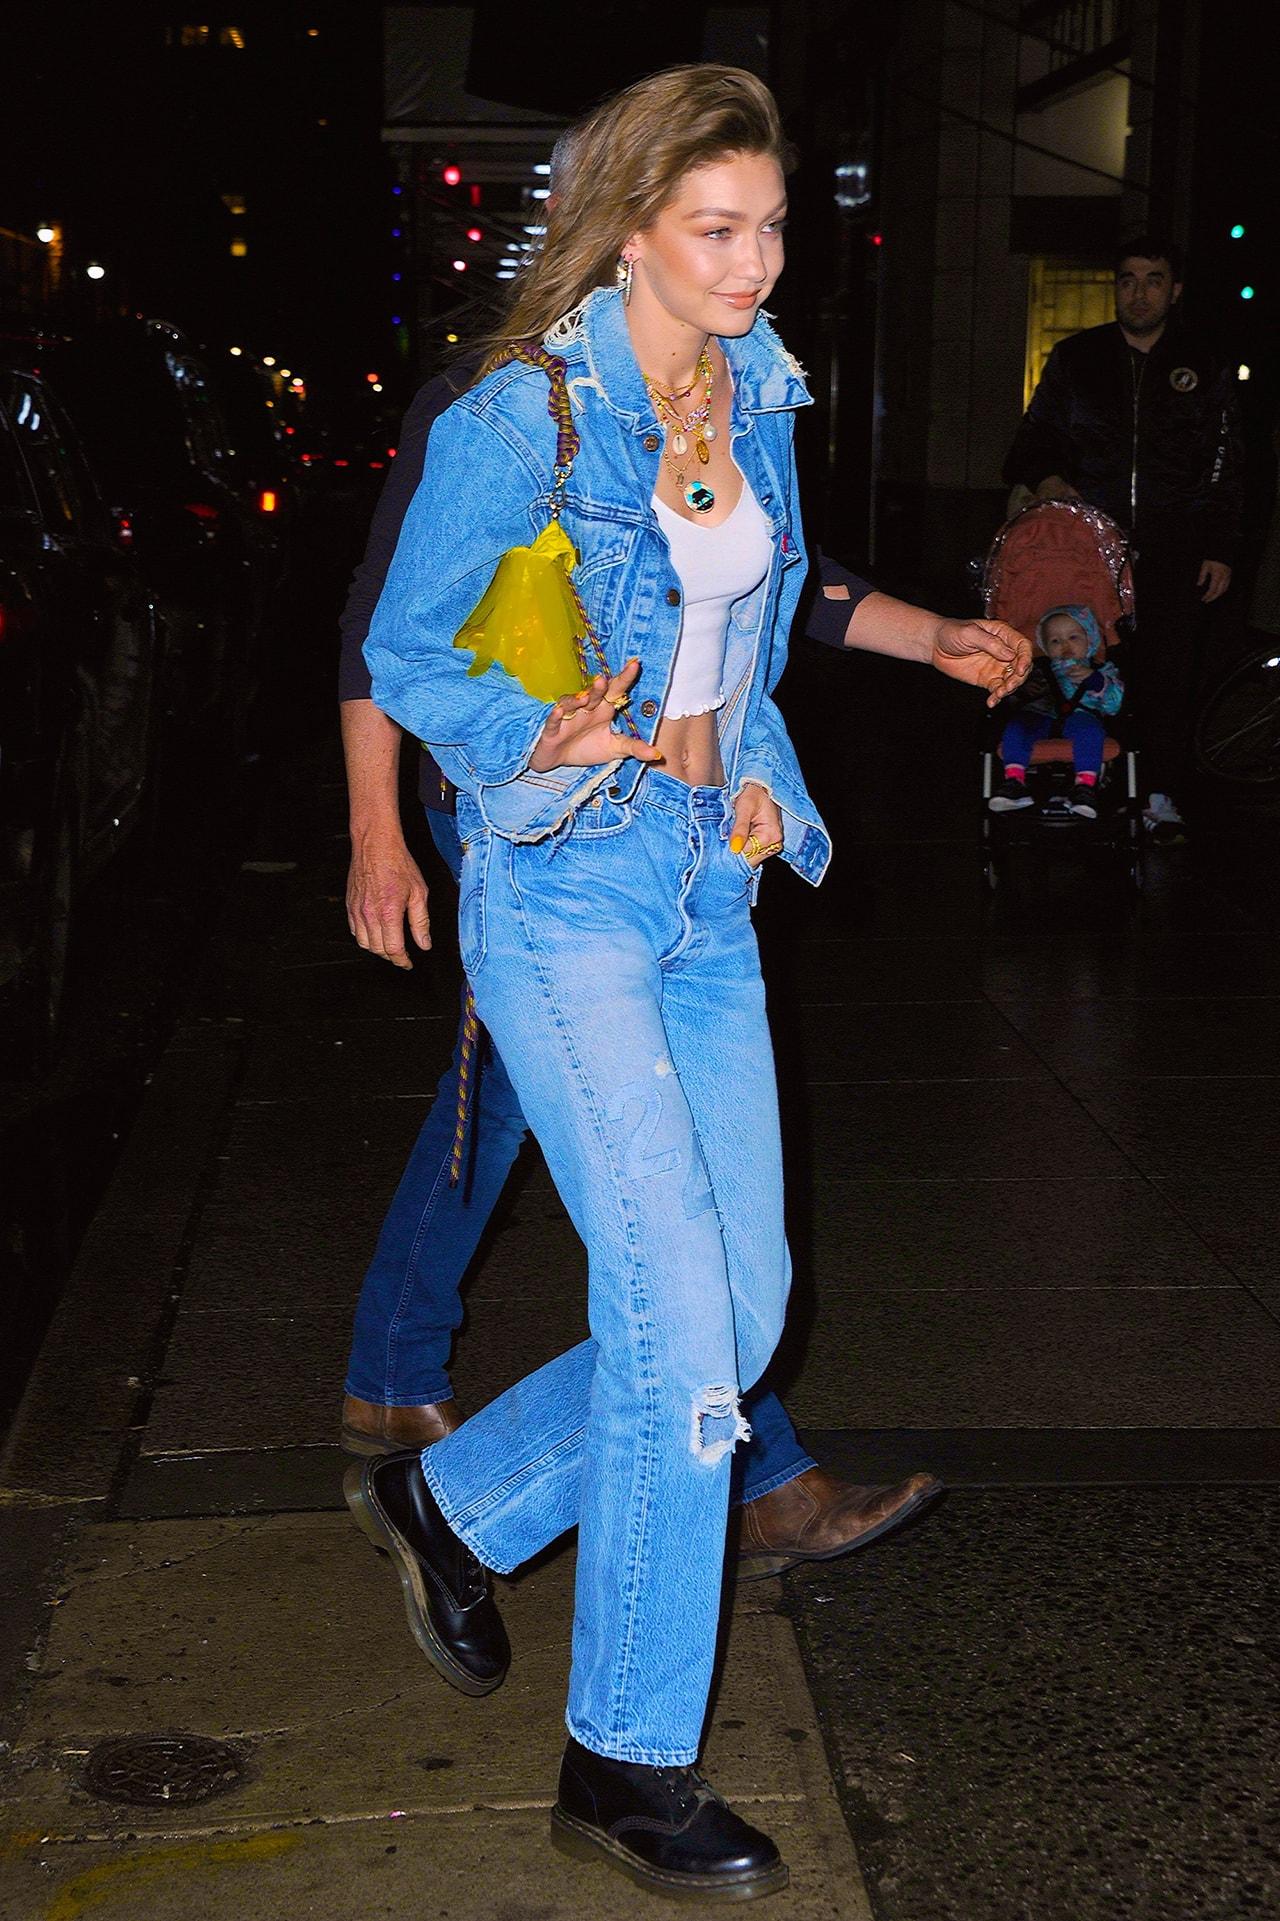 Gigi Haidid Model Supermodel Fendi Puffer Jacket Zucca FF Logo Red Sunglasses Off Duty Style Outfit Fashion